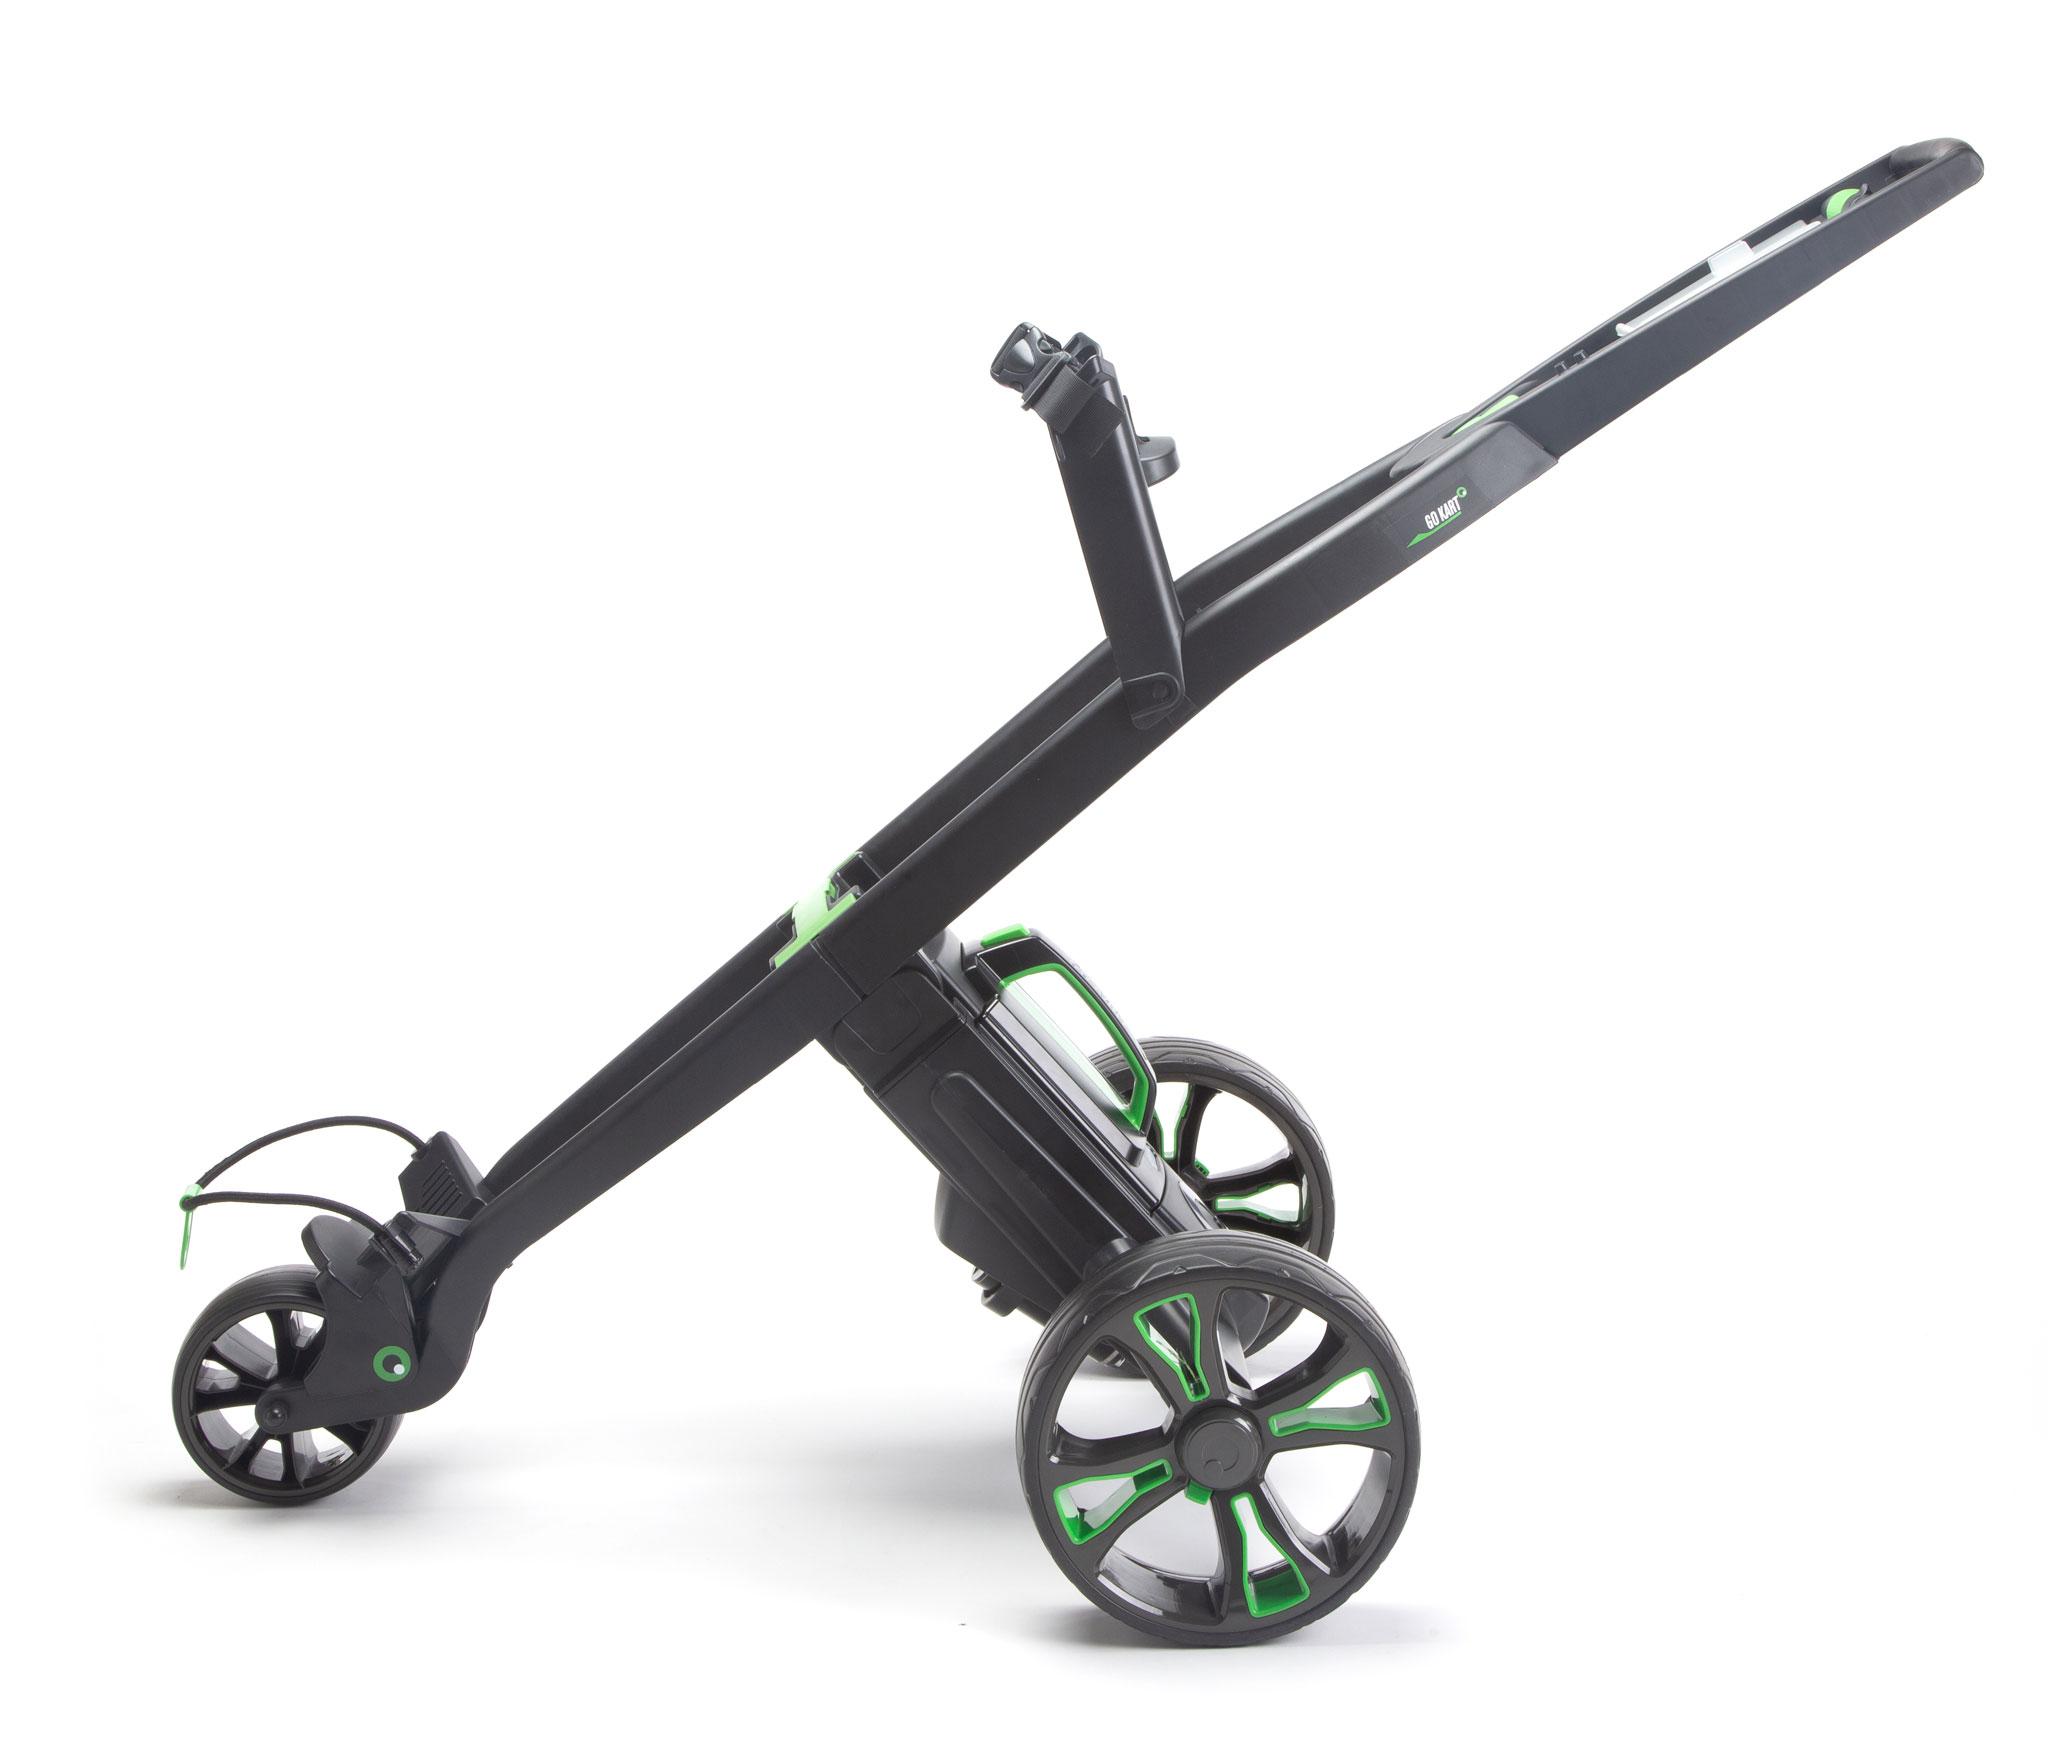 Gokart Electric Golf Trolleys Award Winning Golf Carts